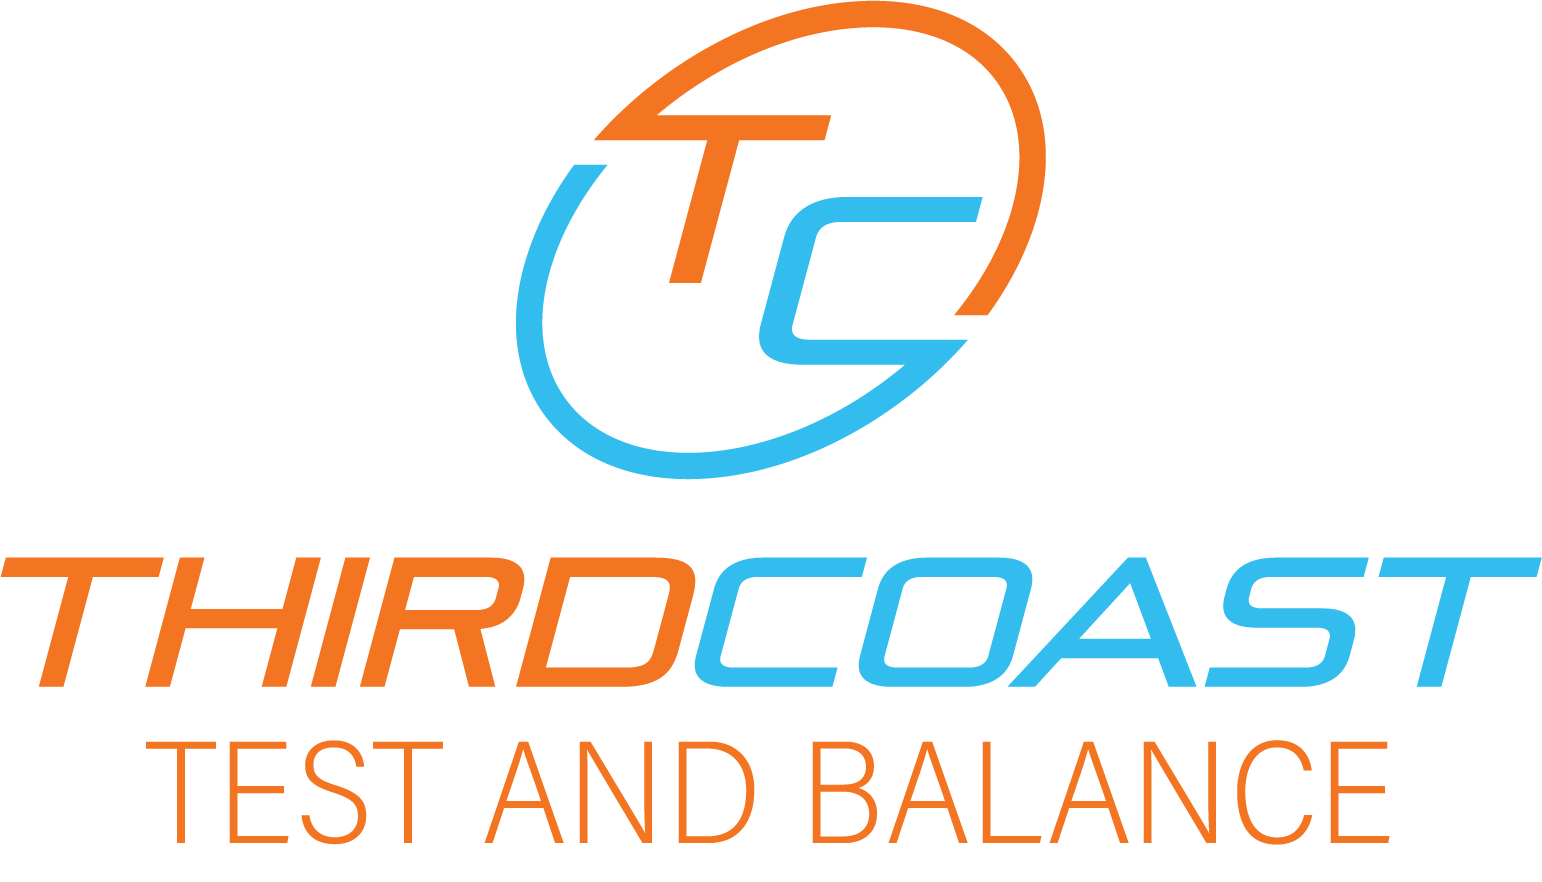 centered_colored_logo